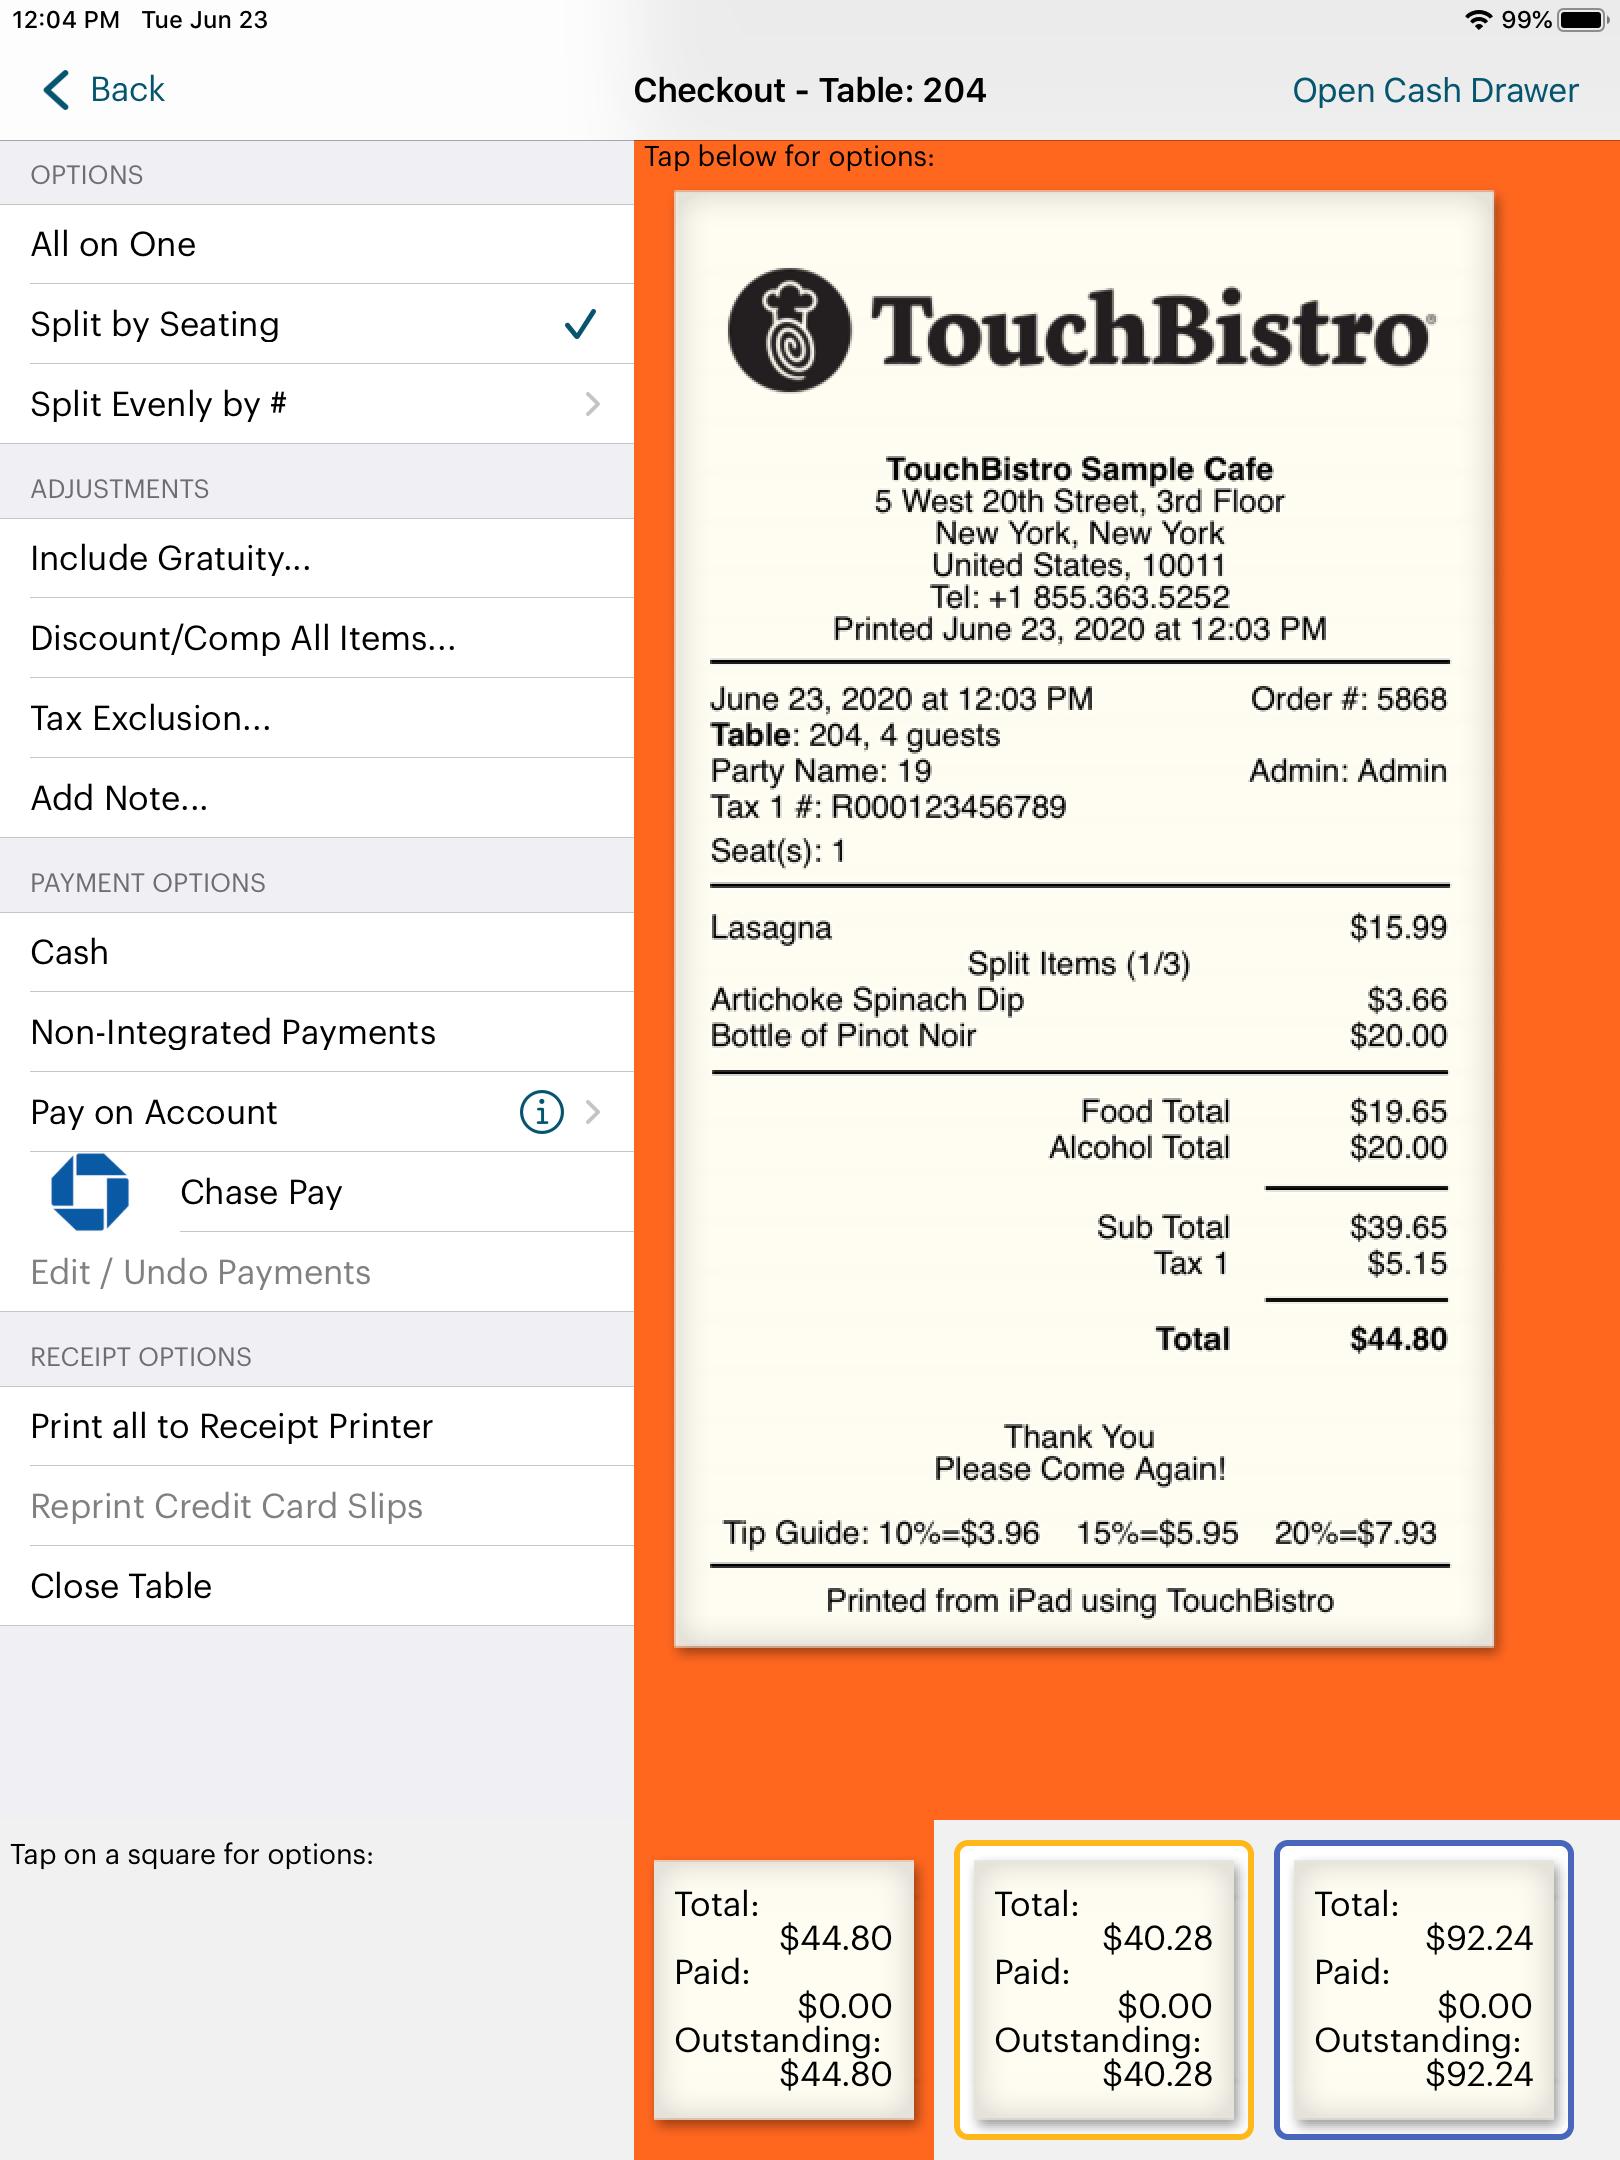 TouchBistro Software - TouchBistro Check Out